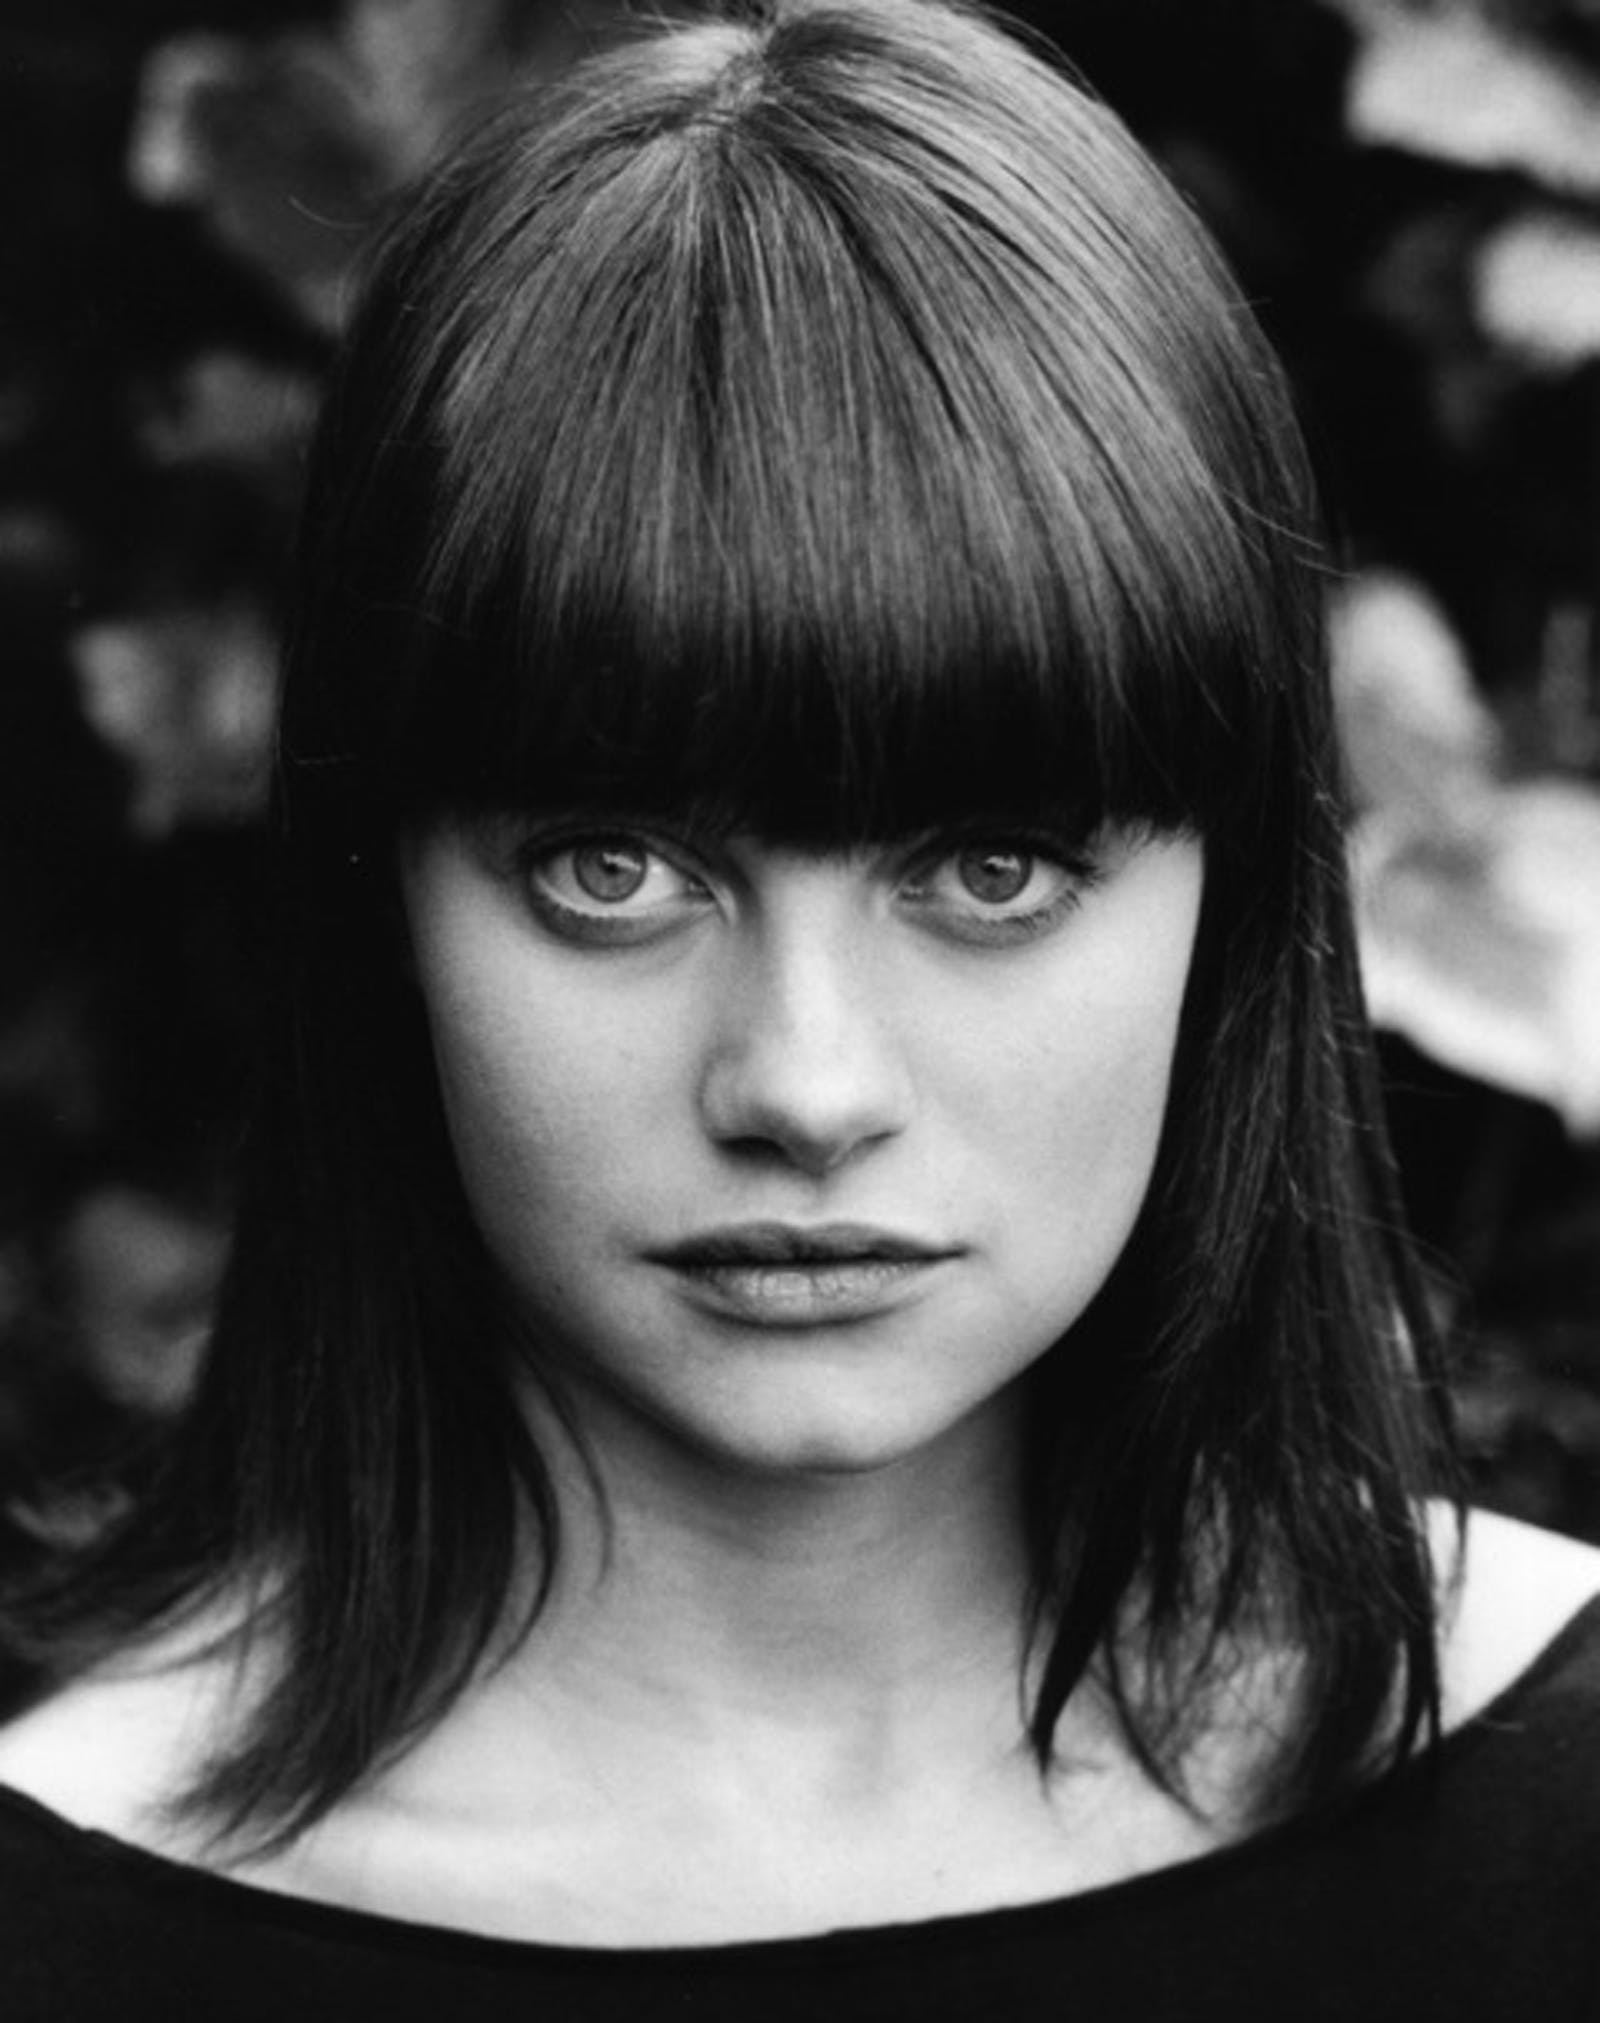 Abigail hardingham